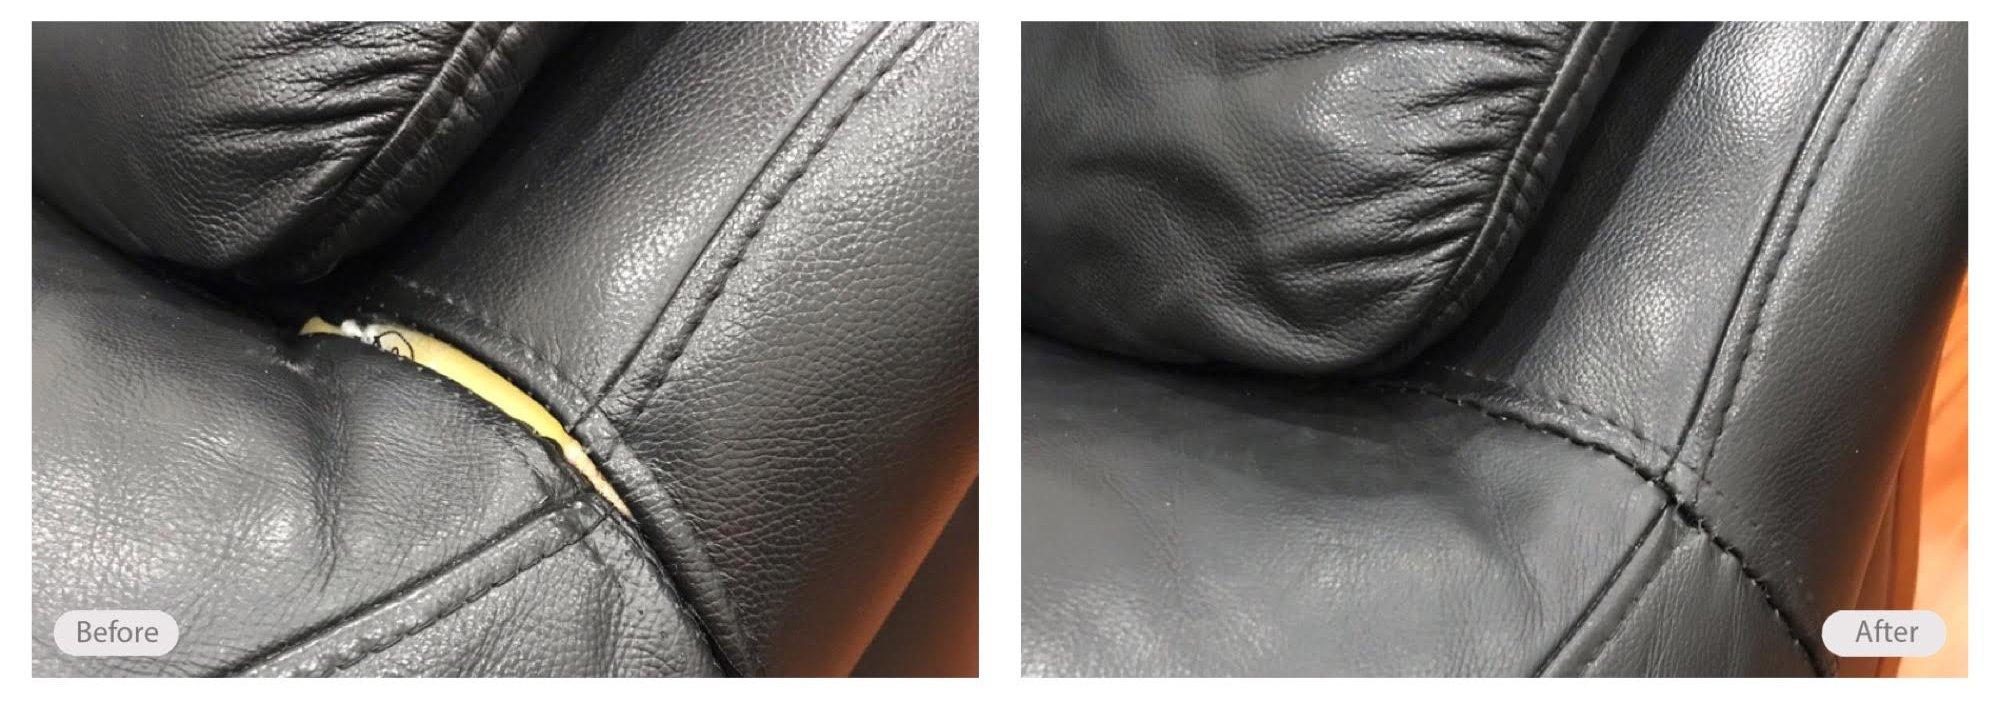 Light Upholstery Repair & Restoration Service